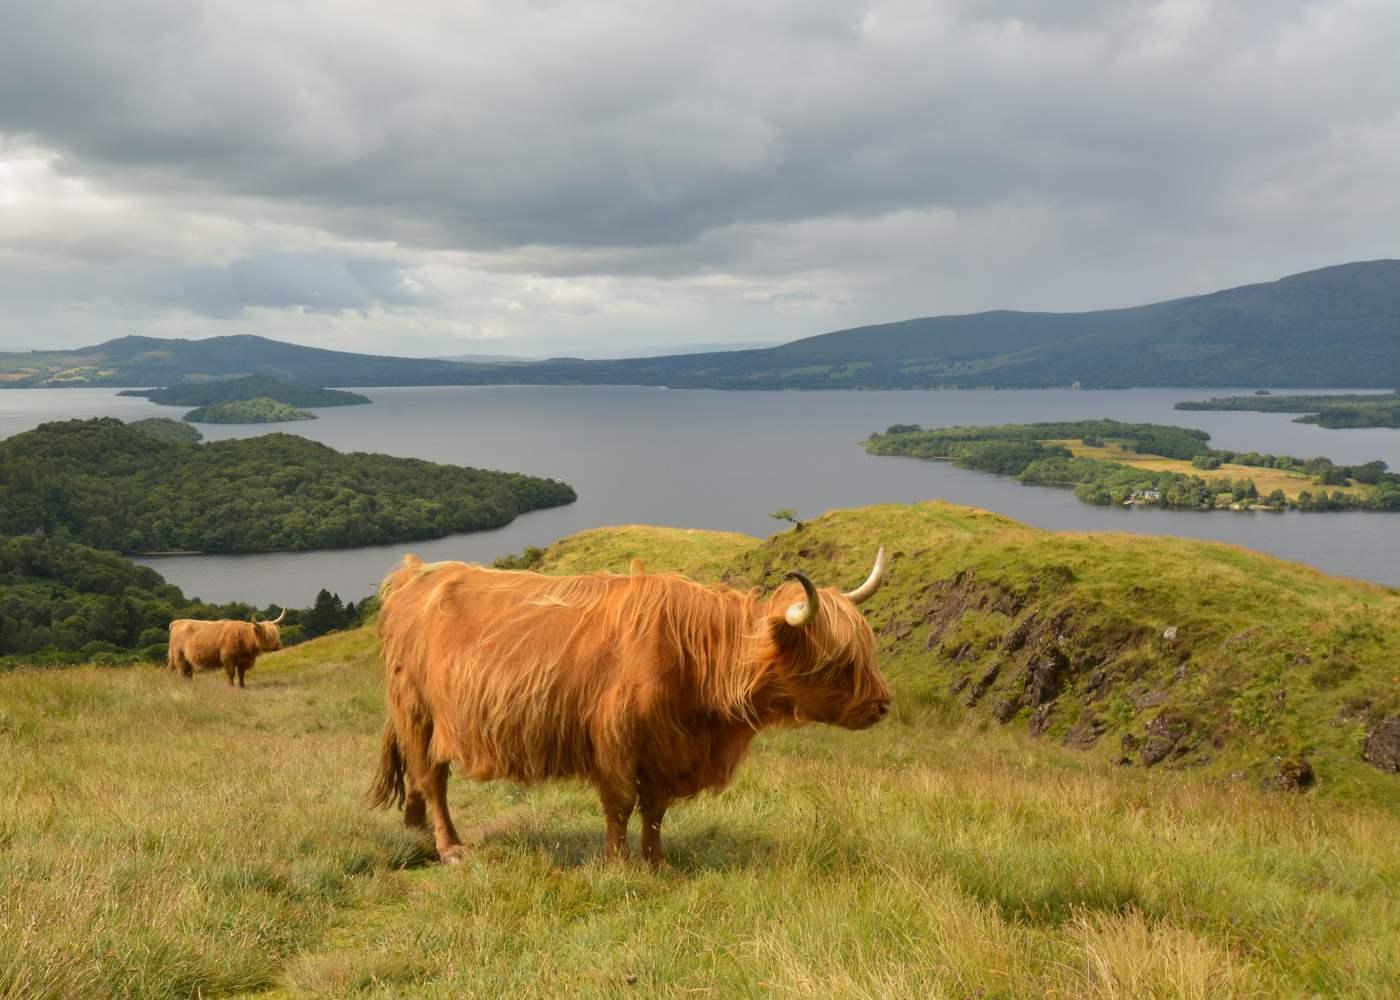 Loch Lomond nas Highlands daEscócia